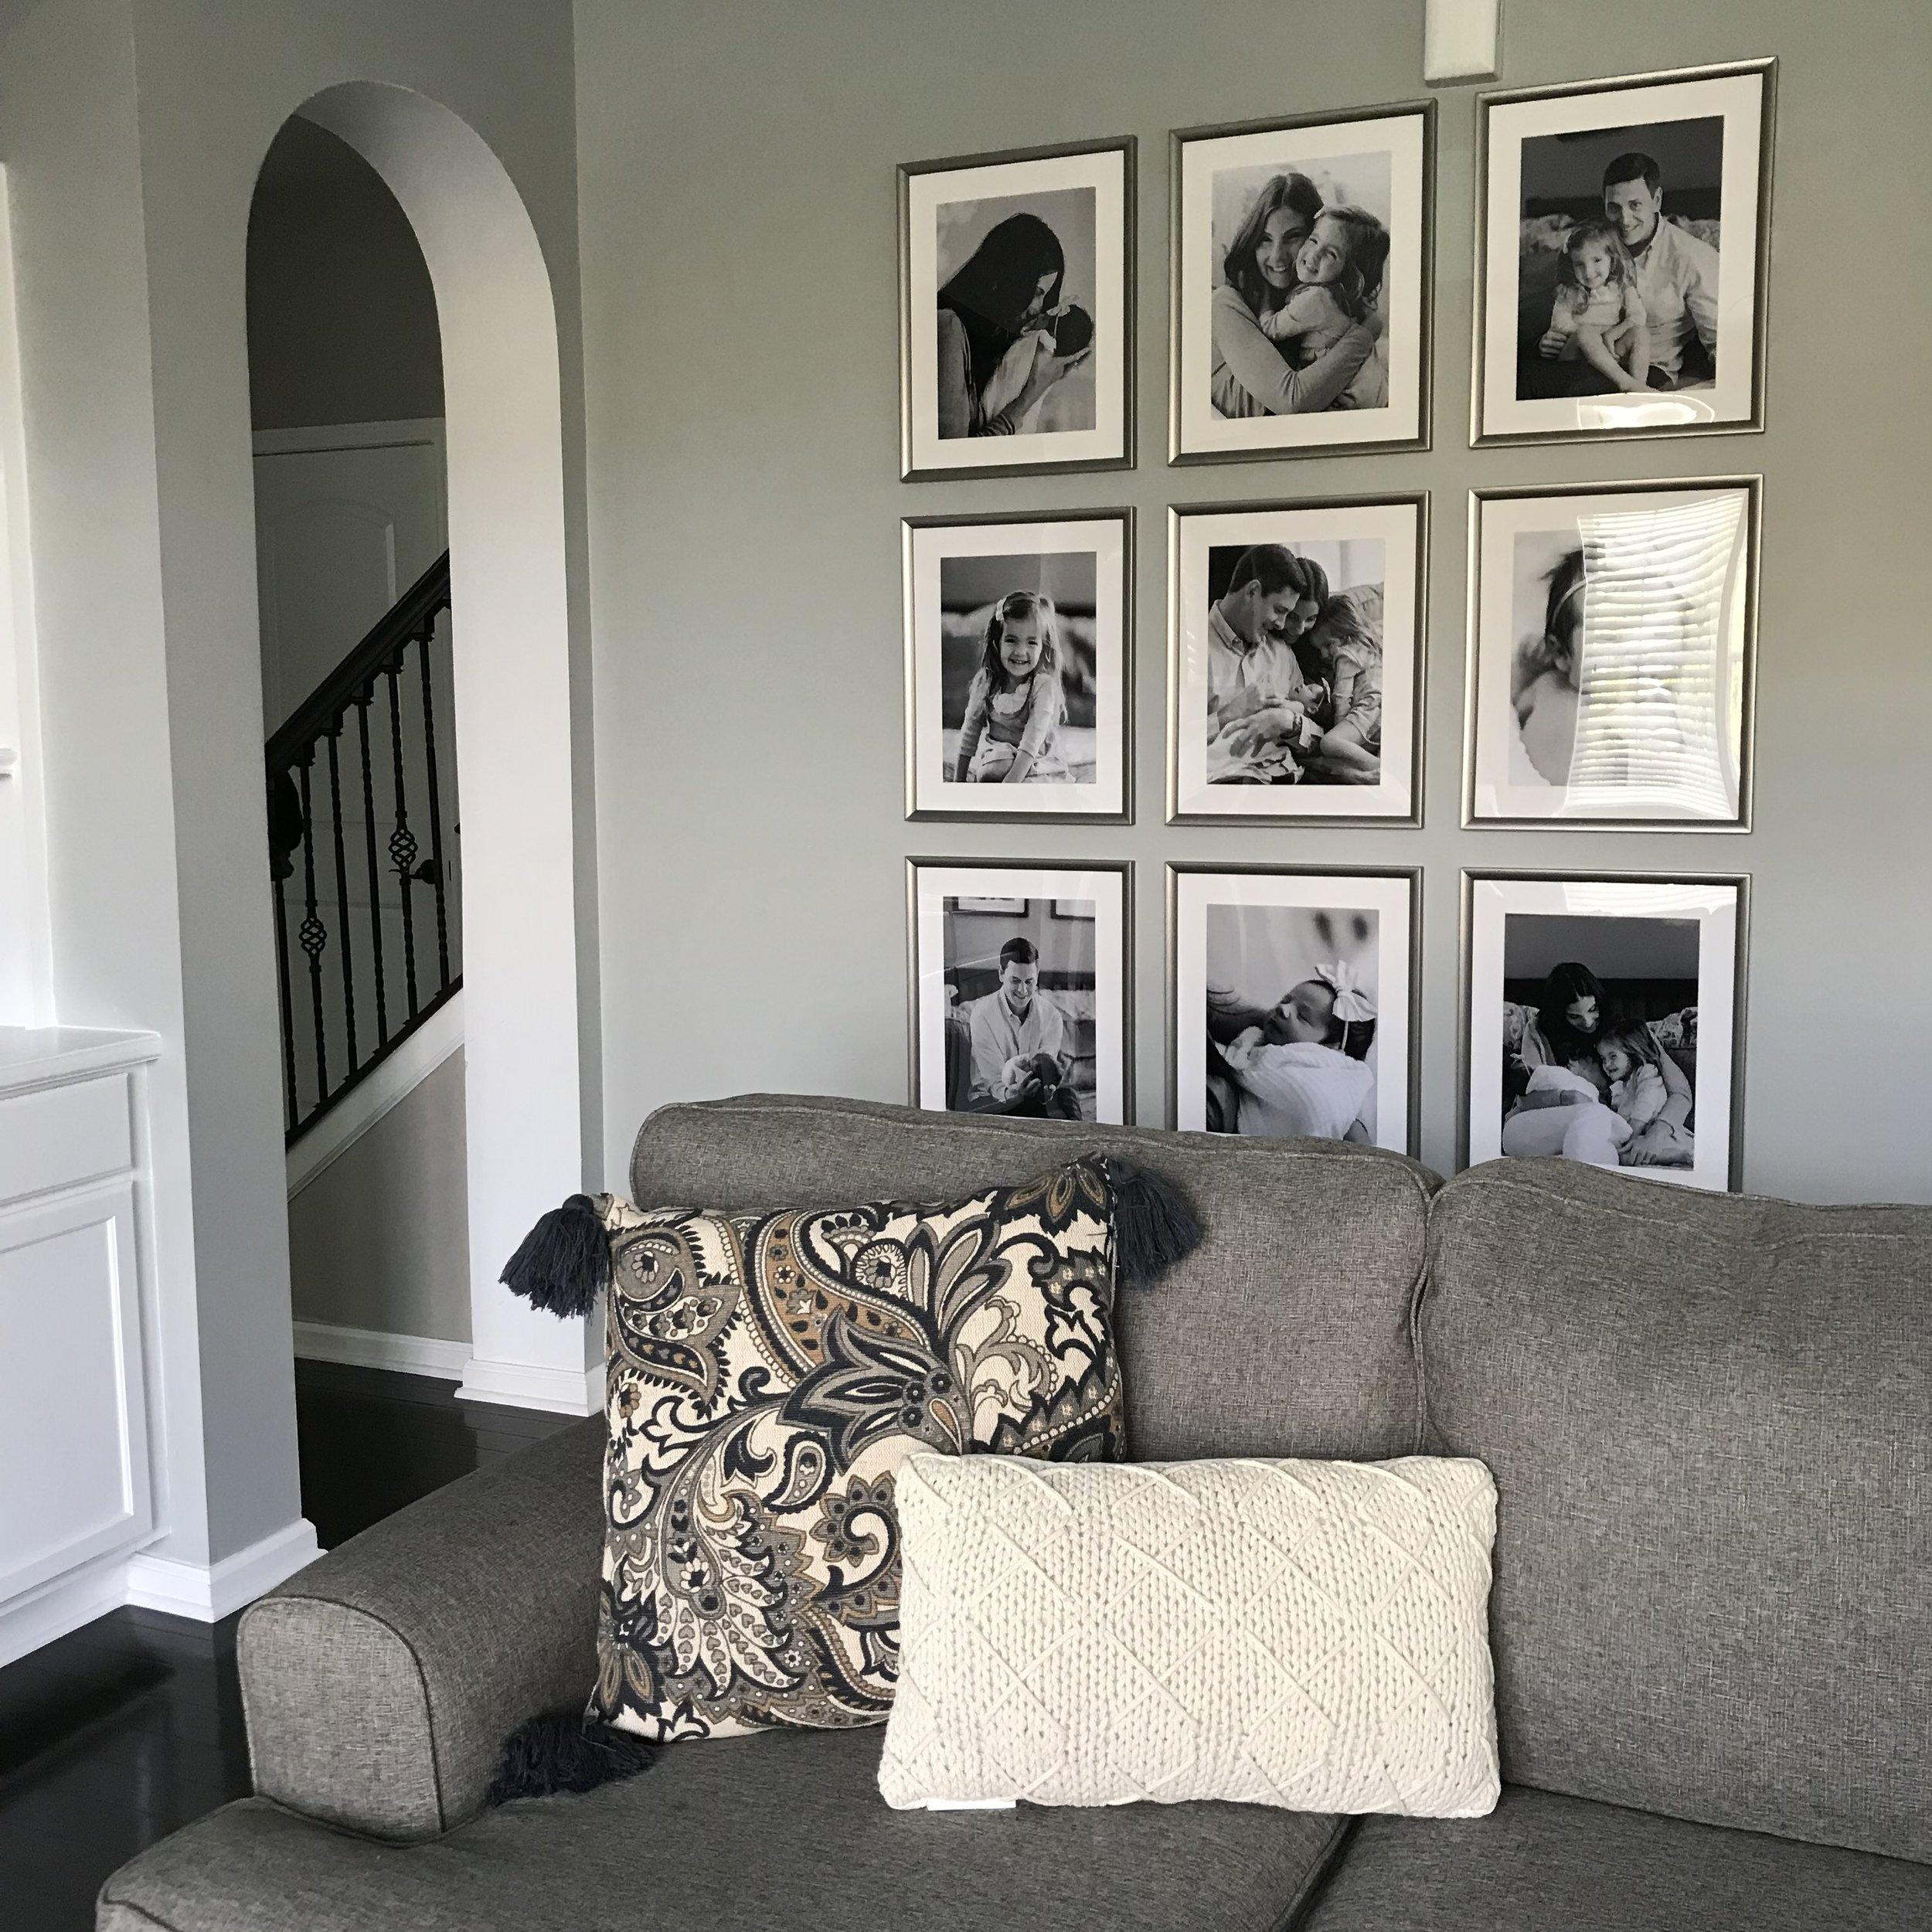 Classic Family Room - The Baer Minimalist